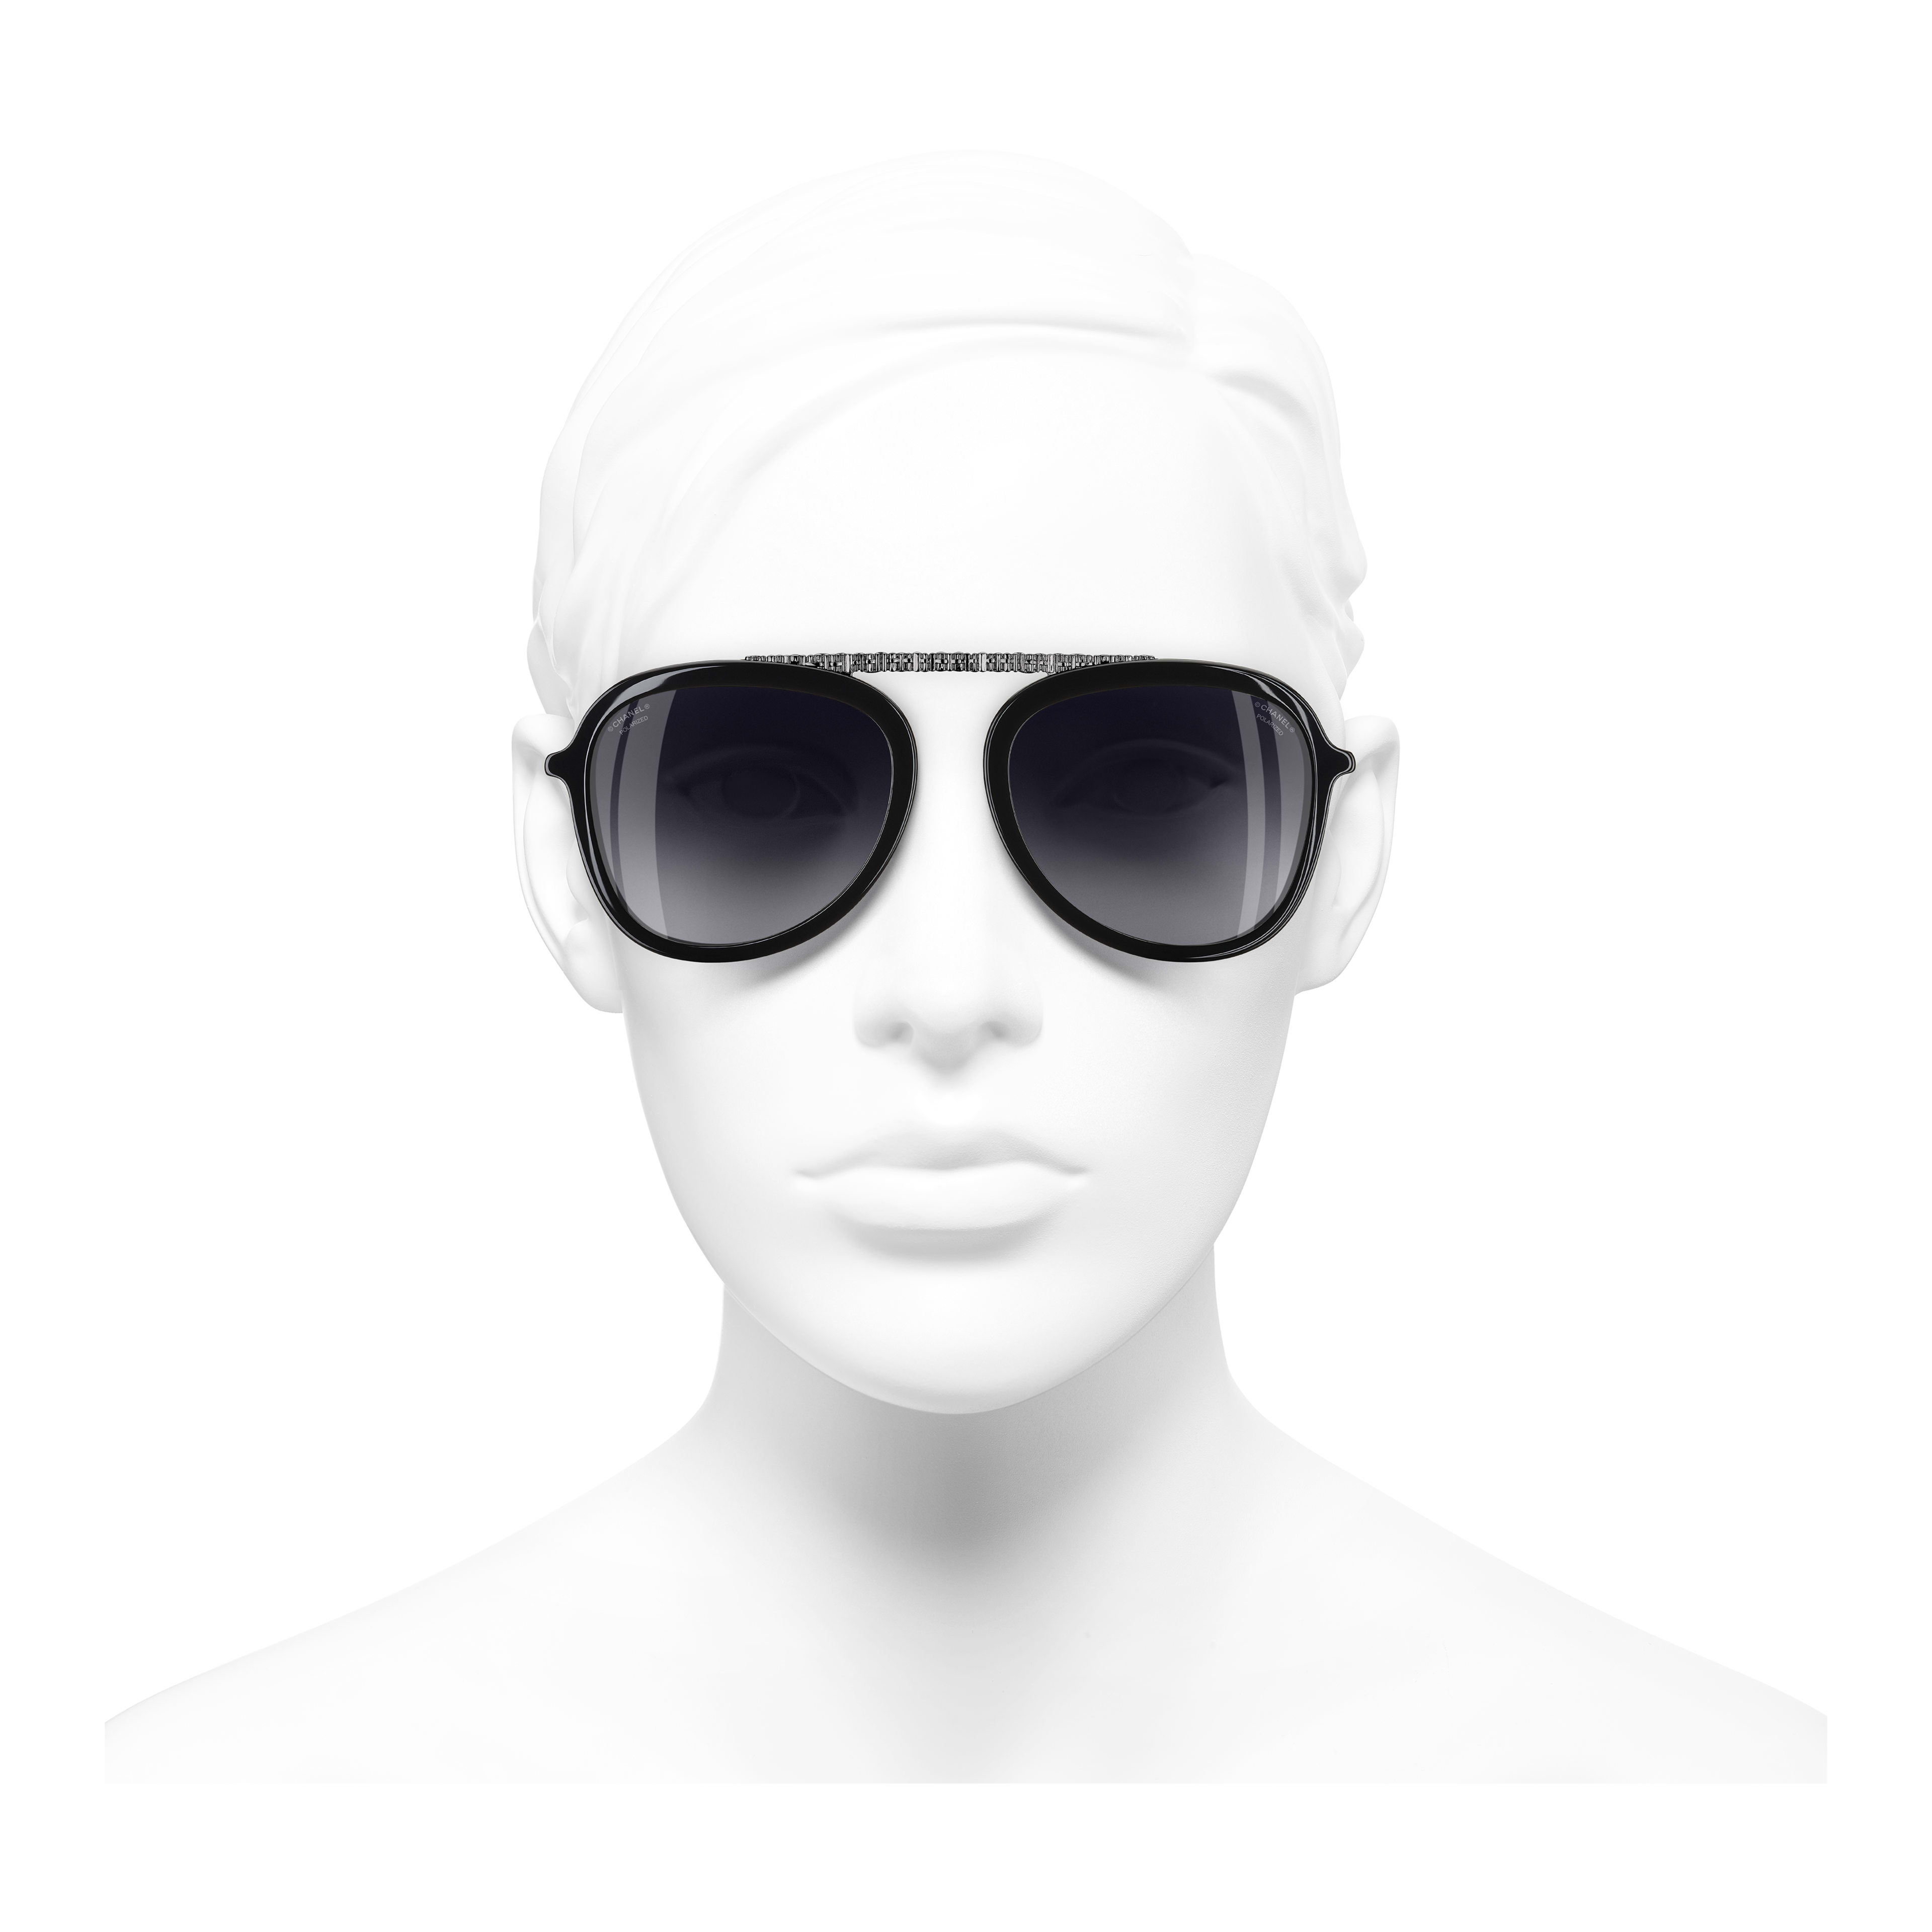 Pilot Sunglasses Acetate - Polarized Lenses Black -                                                                     view 2 - see full sized version